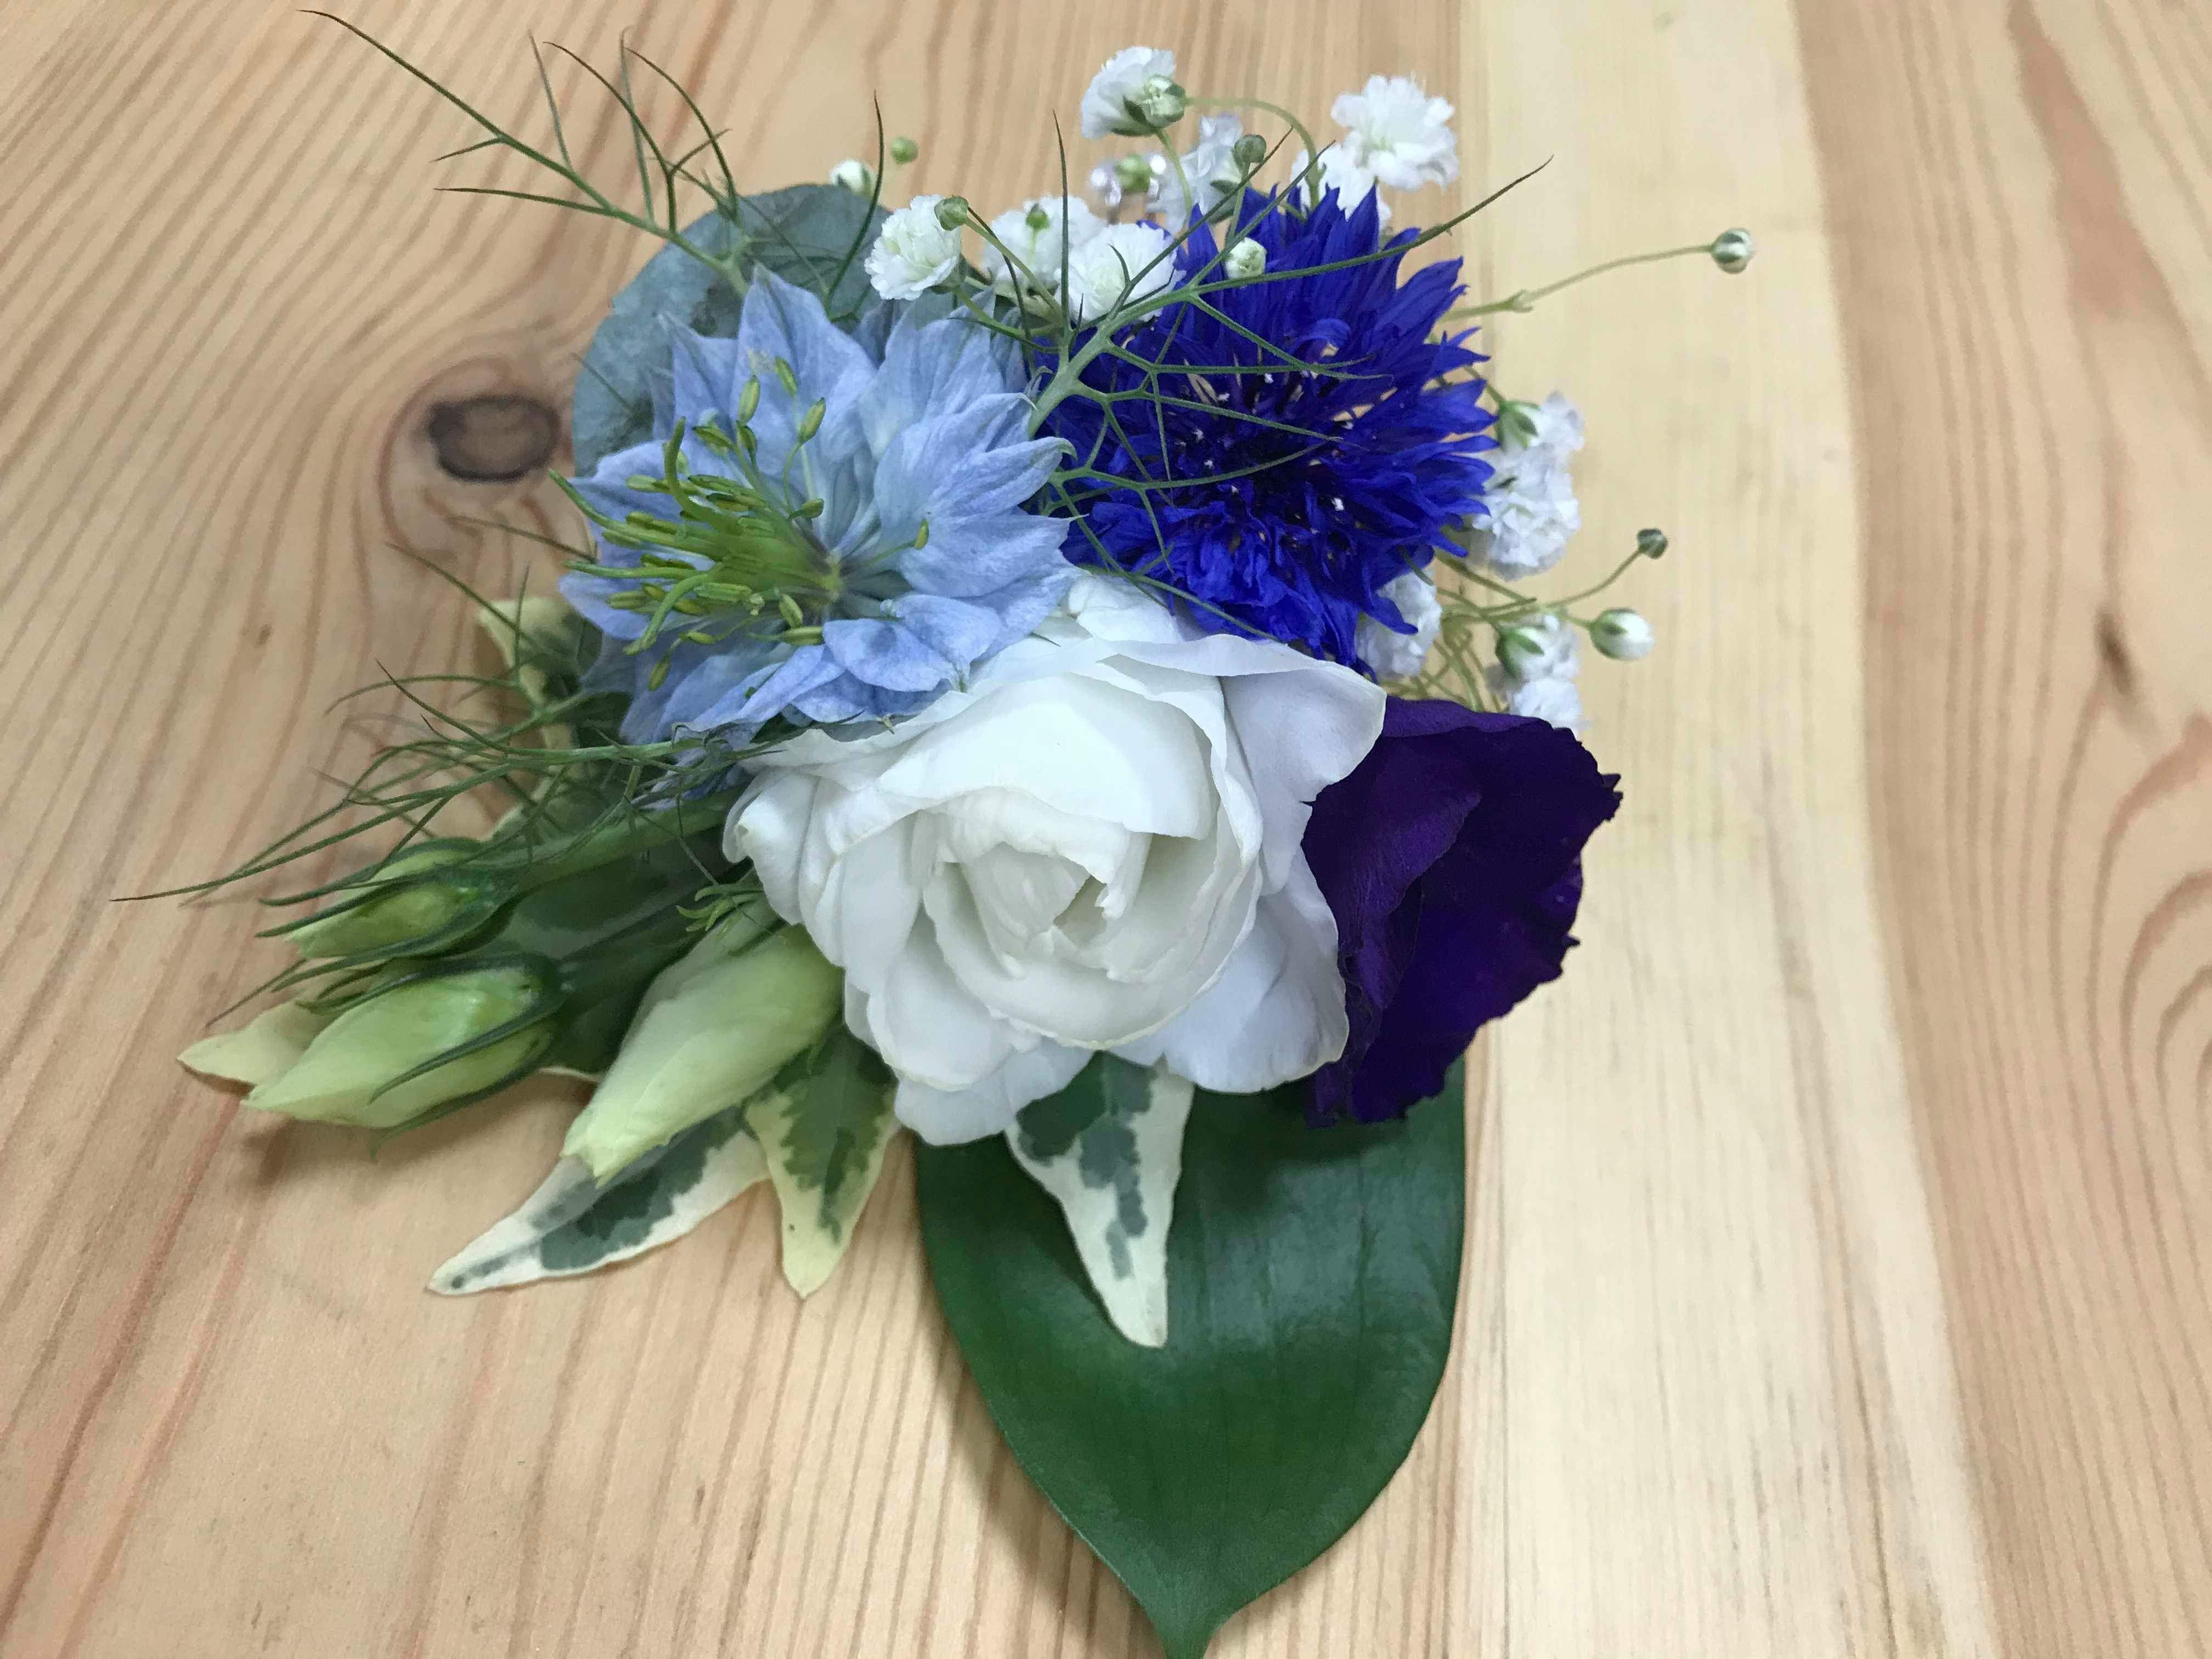 Buttonhole feat. Nigella, Cornflower and Lisianthus